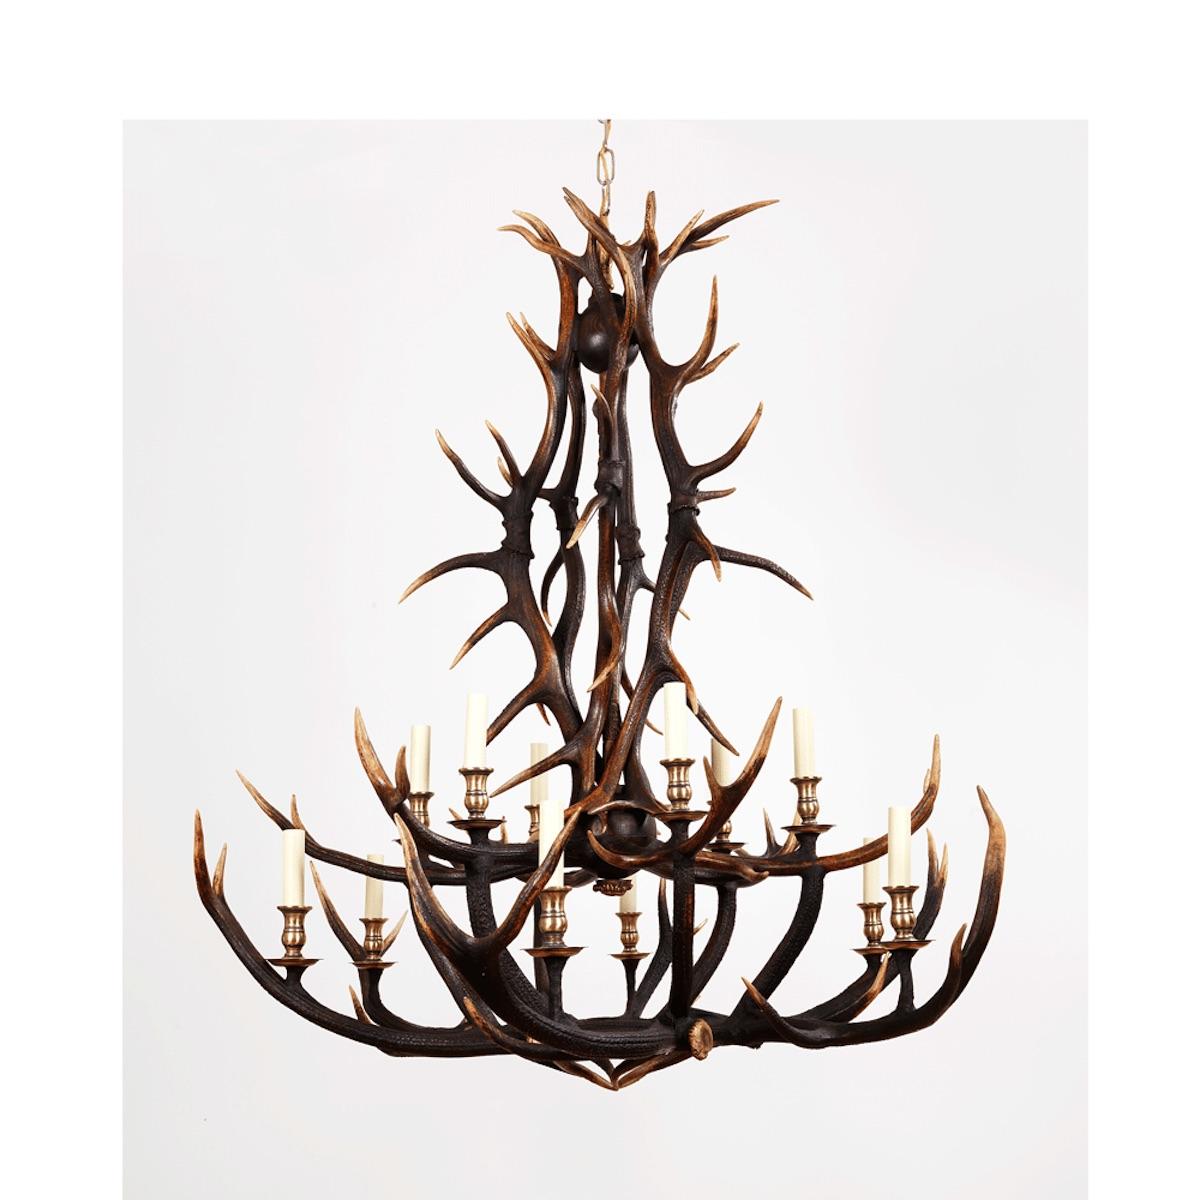 Antlers Two Tier Scottish Highlands Antler Ceiling Lighting Chandelier